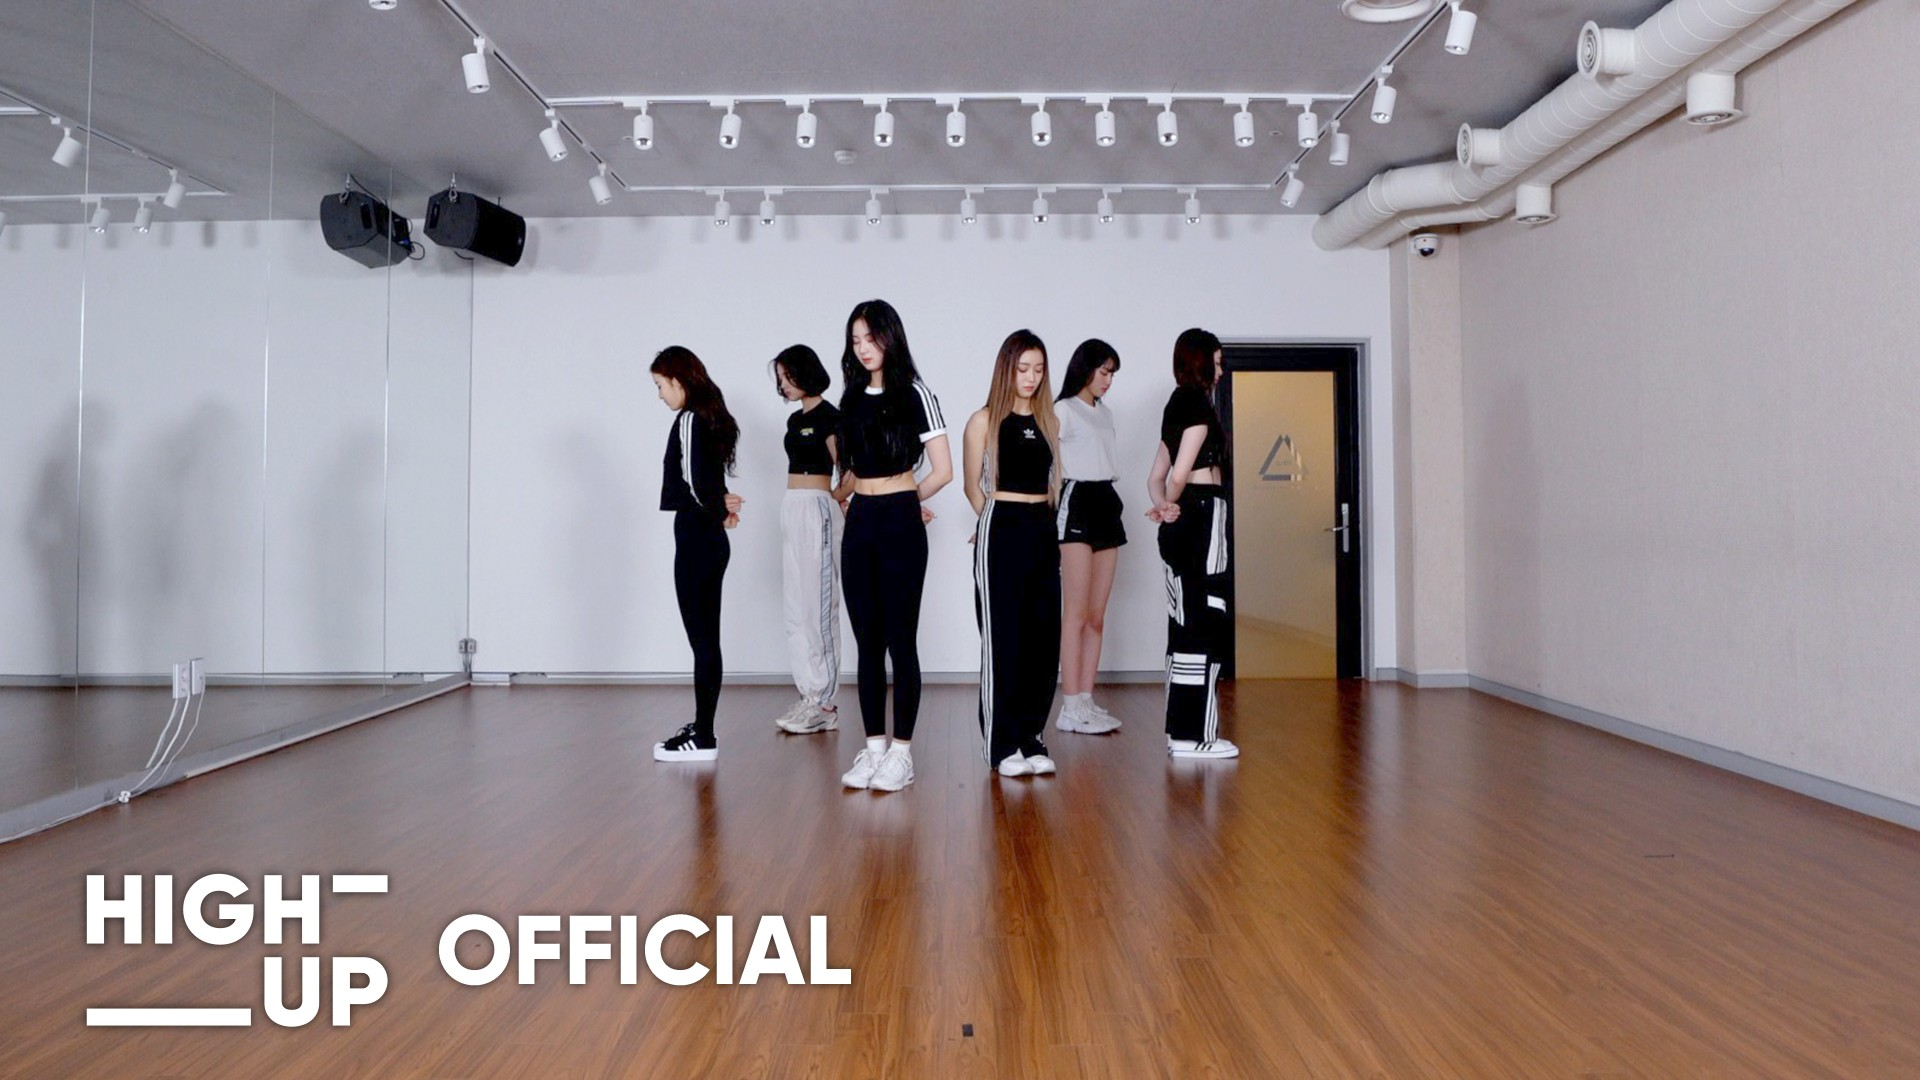 STAYC(스테이씨) 'SO BAD' Dance Practice